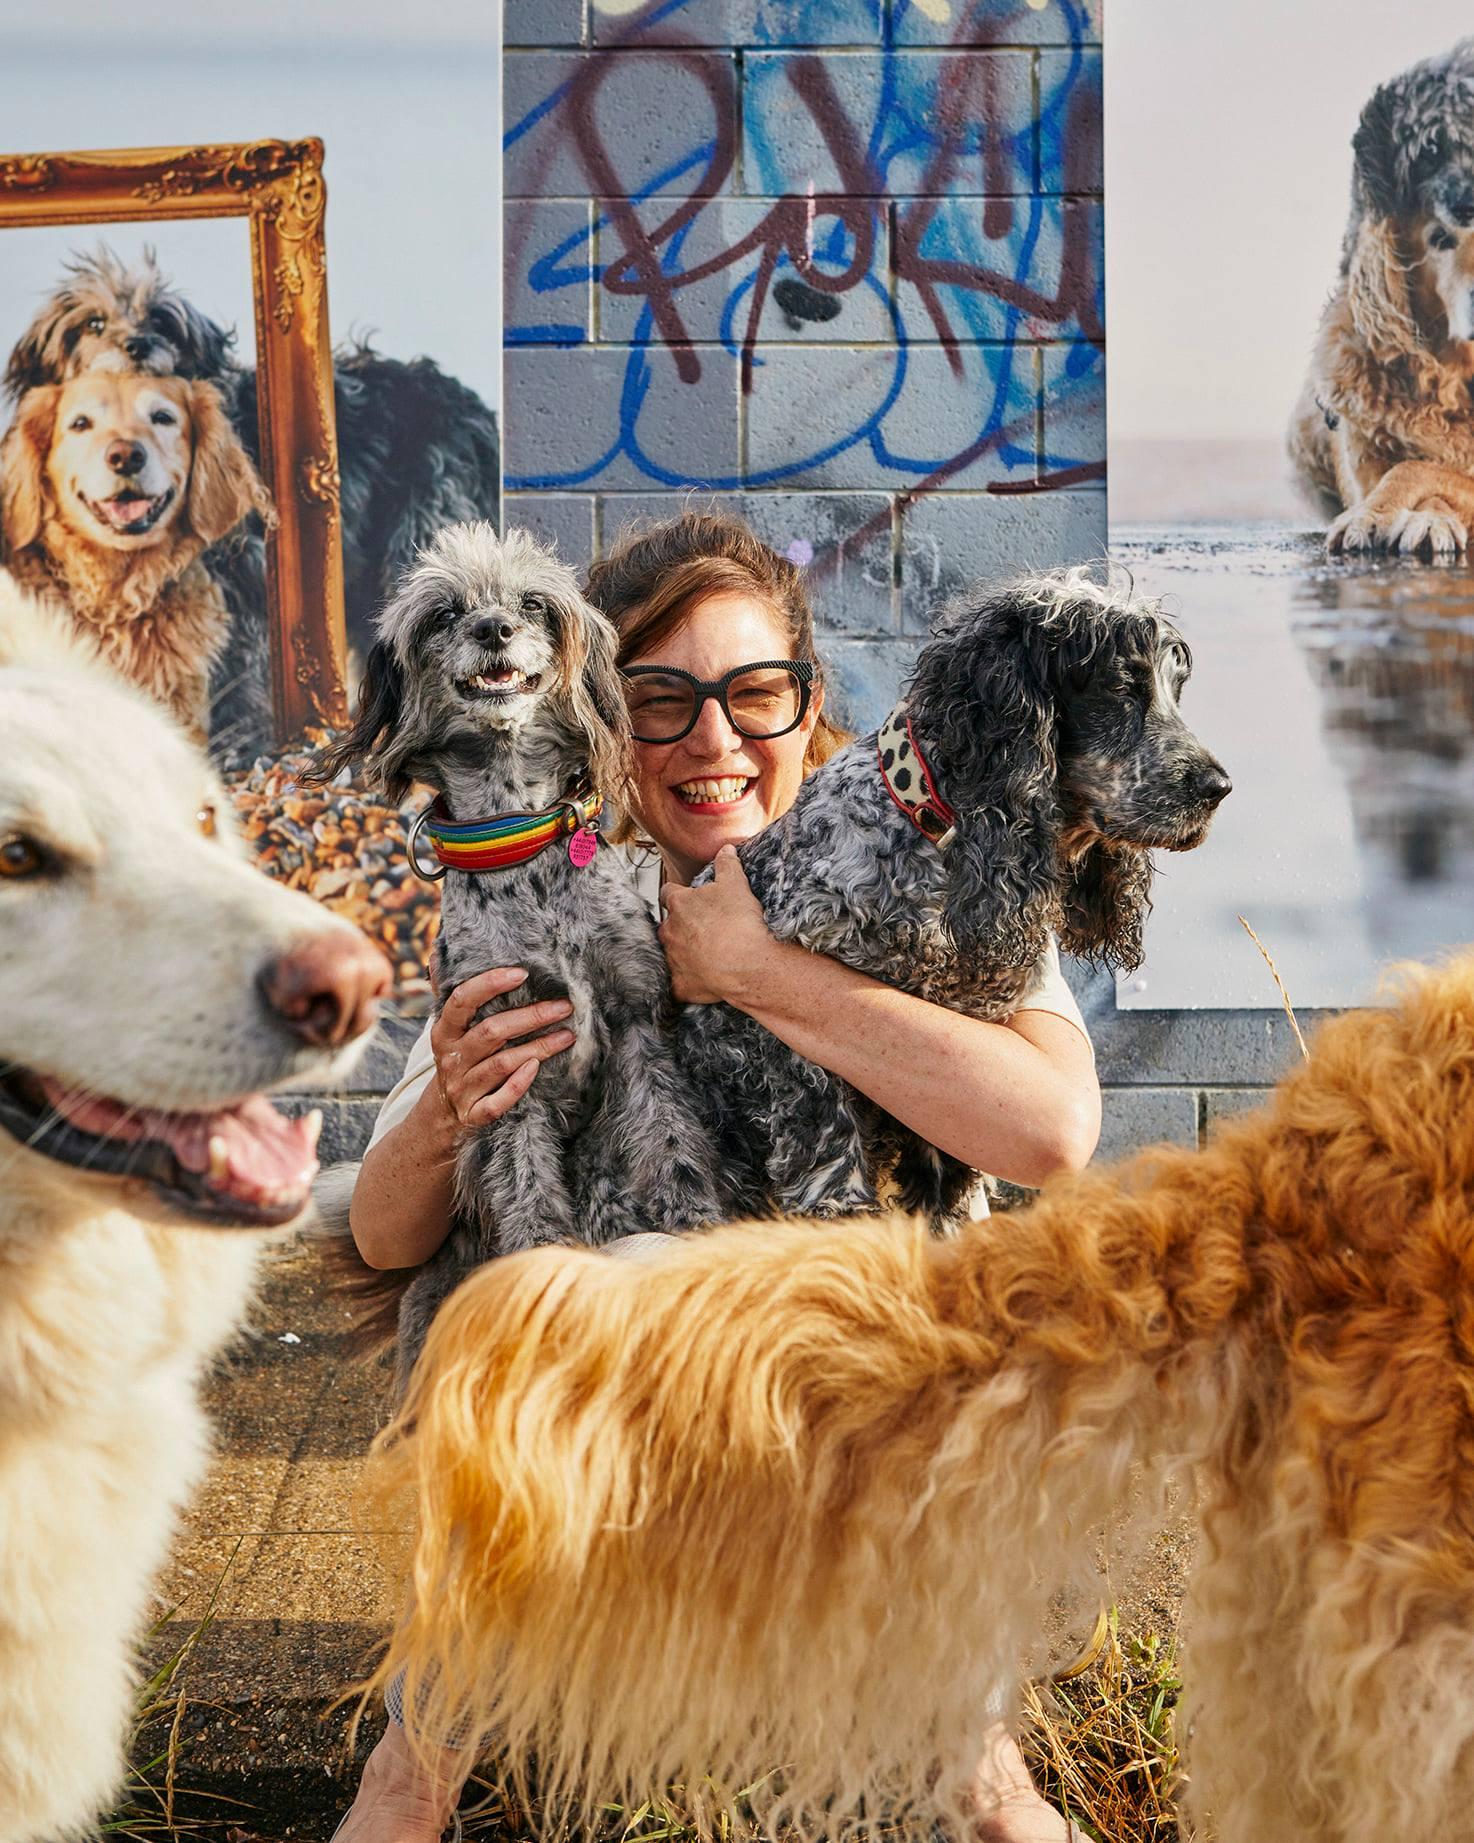 Liz Gregg and her wonderful dogs